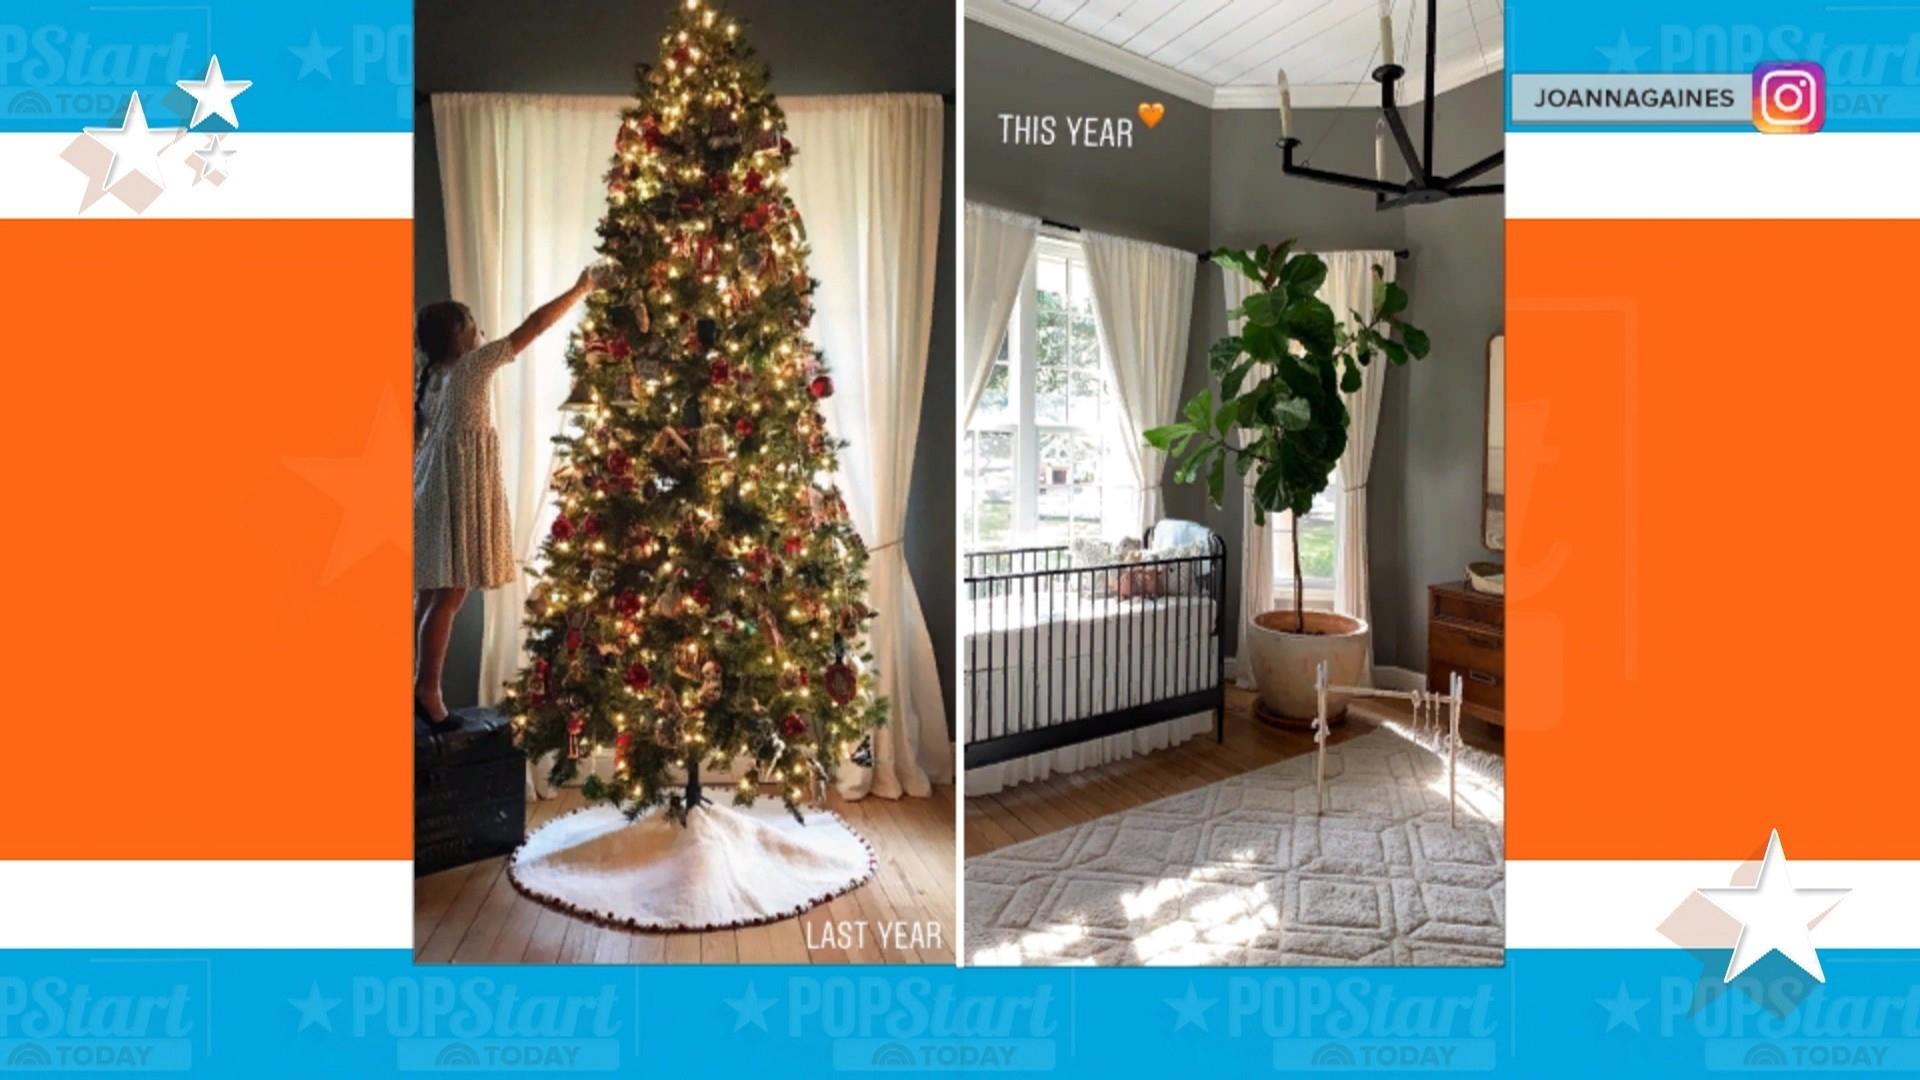 Joanna Gaines Put Her Christmas Tree In Her Bedroom